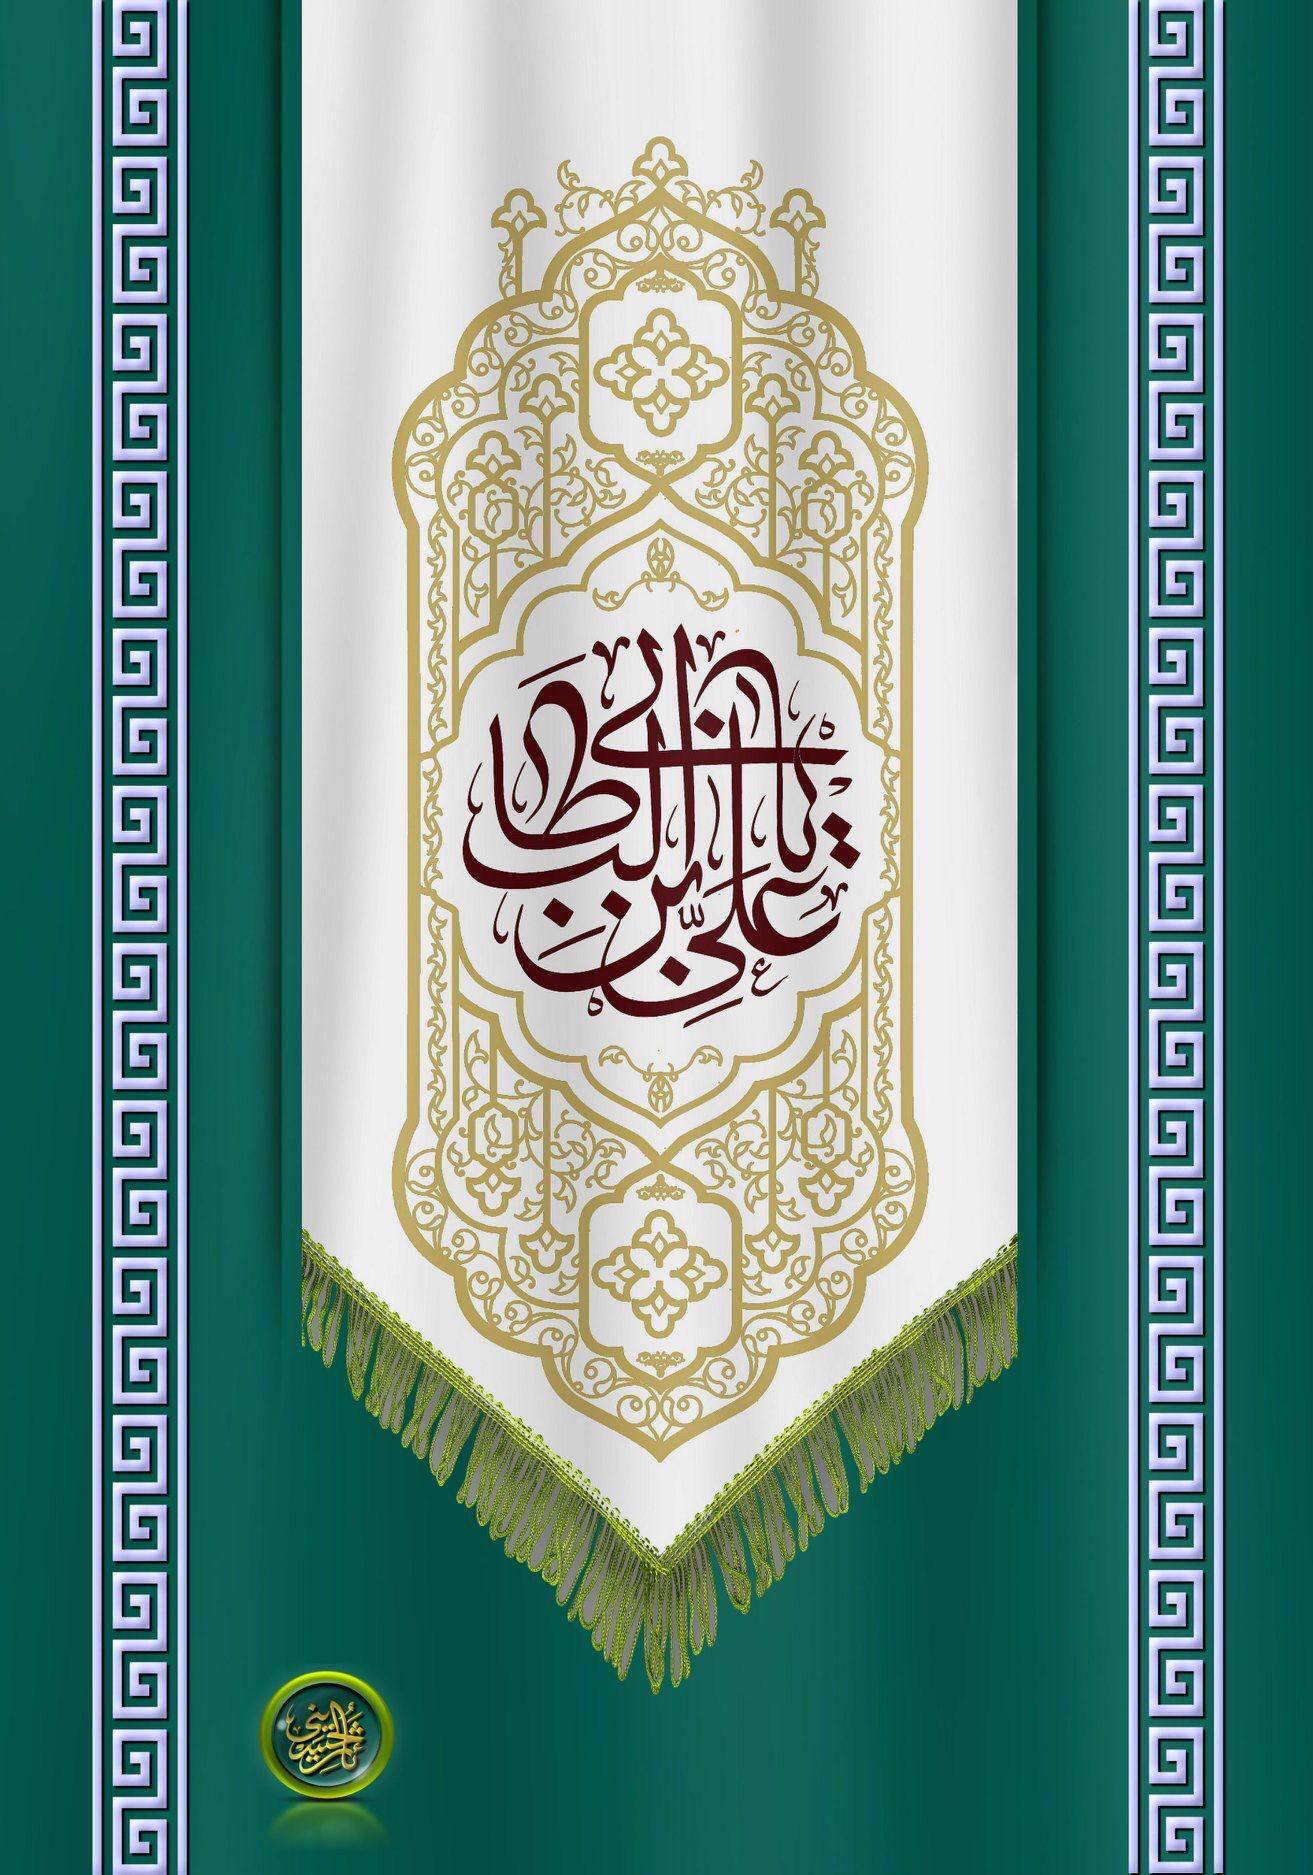 Pin By Rabbie Hanna On Calligraphy Islamic Wallpaper Islamic Wallpaper Iphone Islamic Art